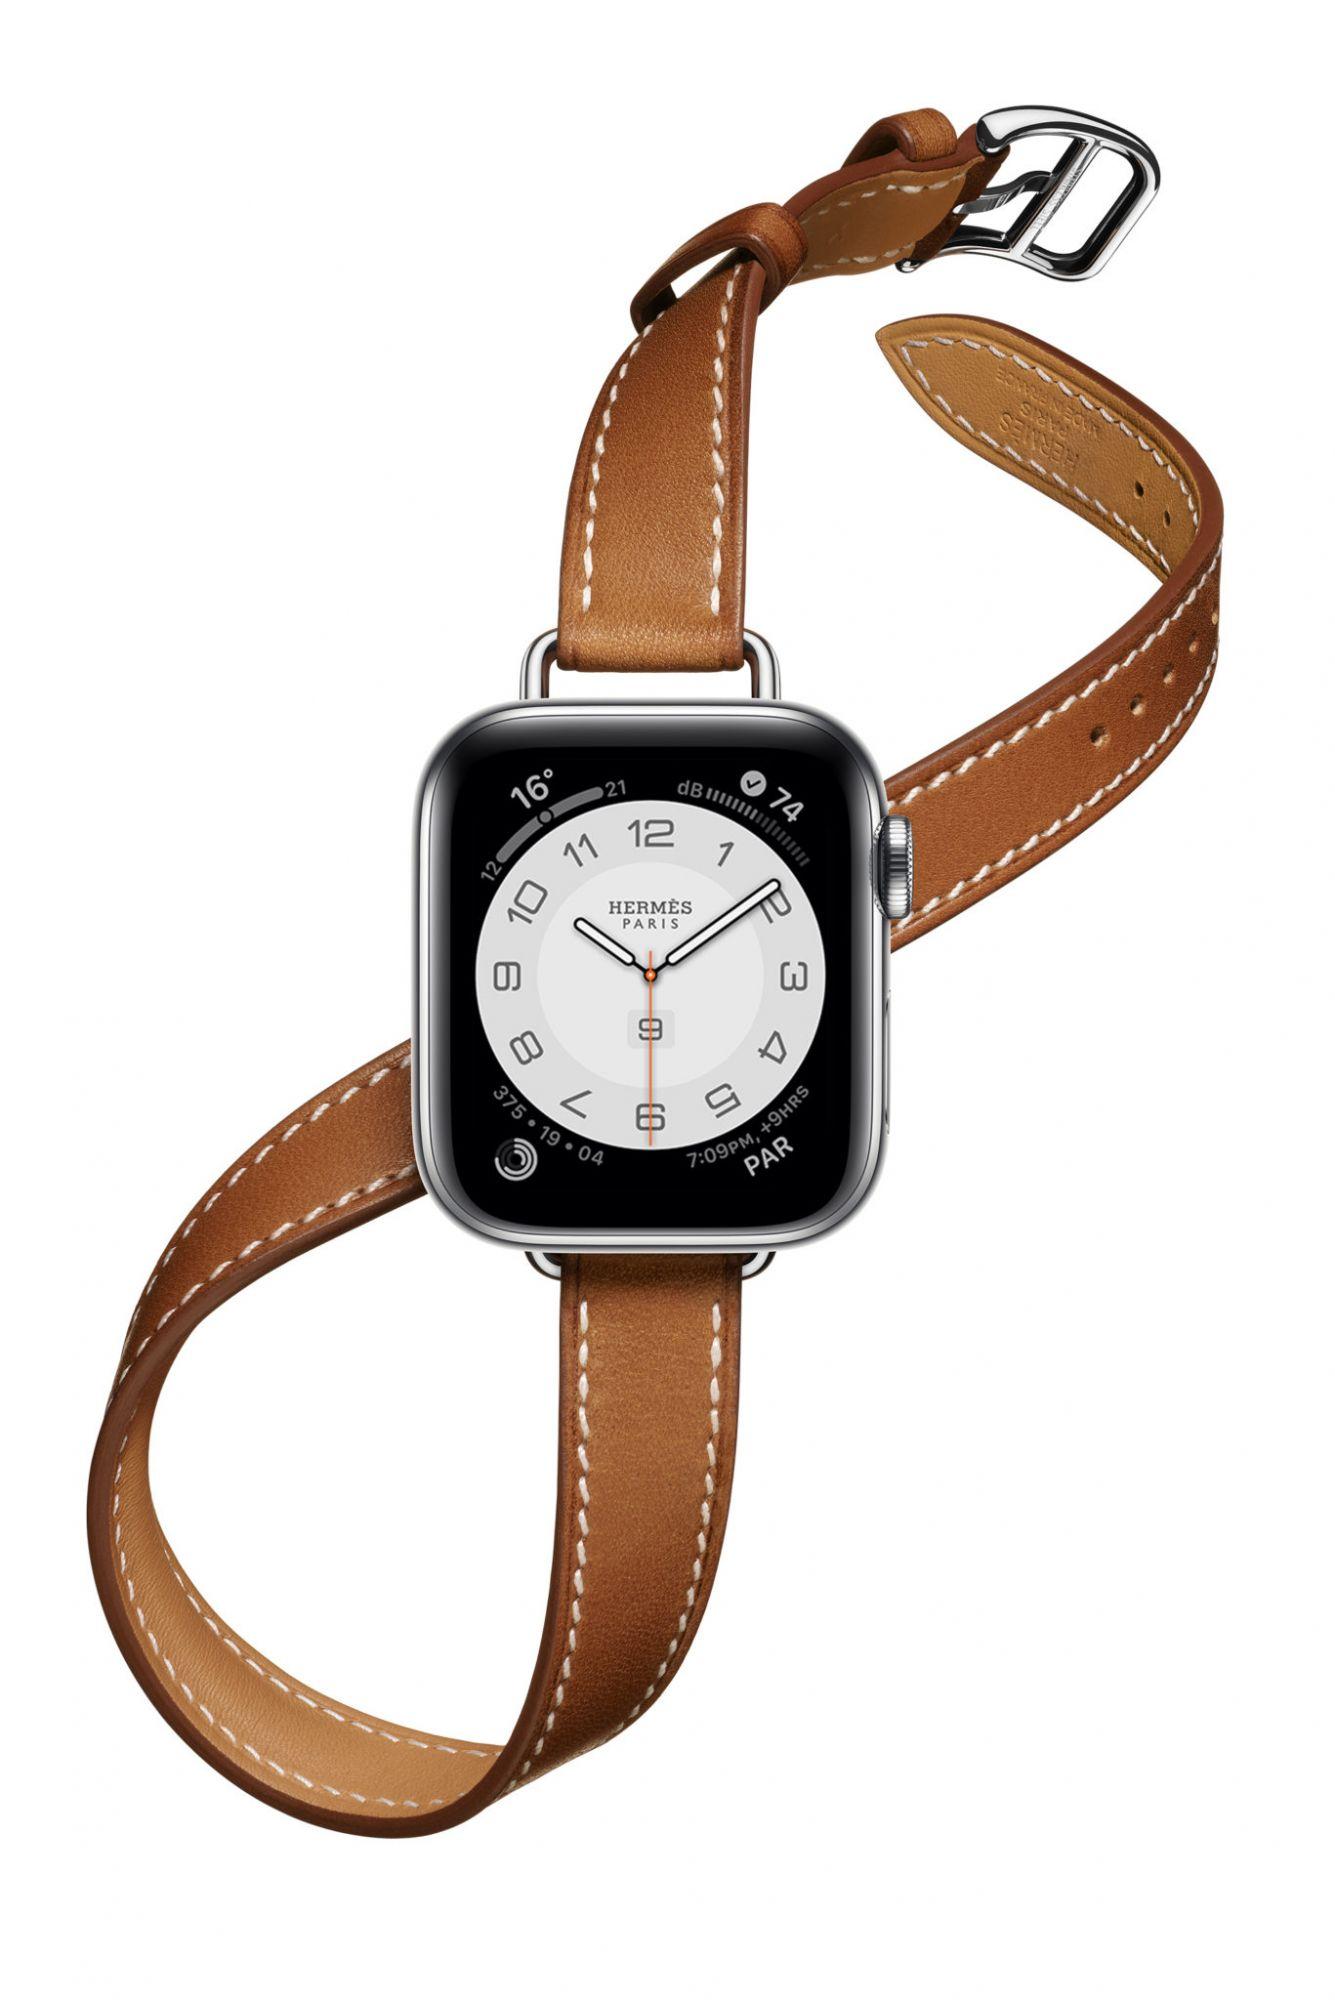 5-best-apple-watch-straps-hermes-double